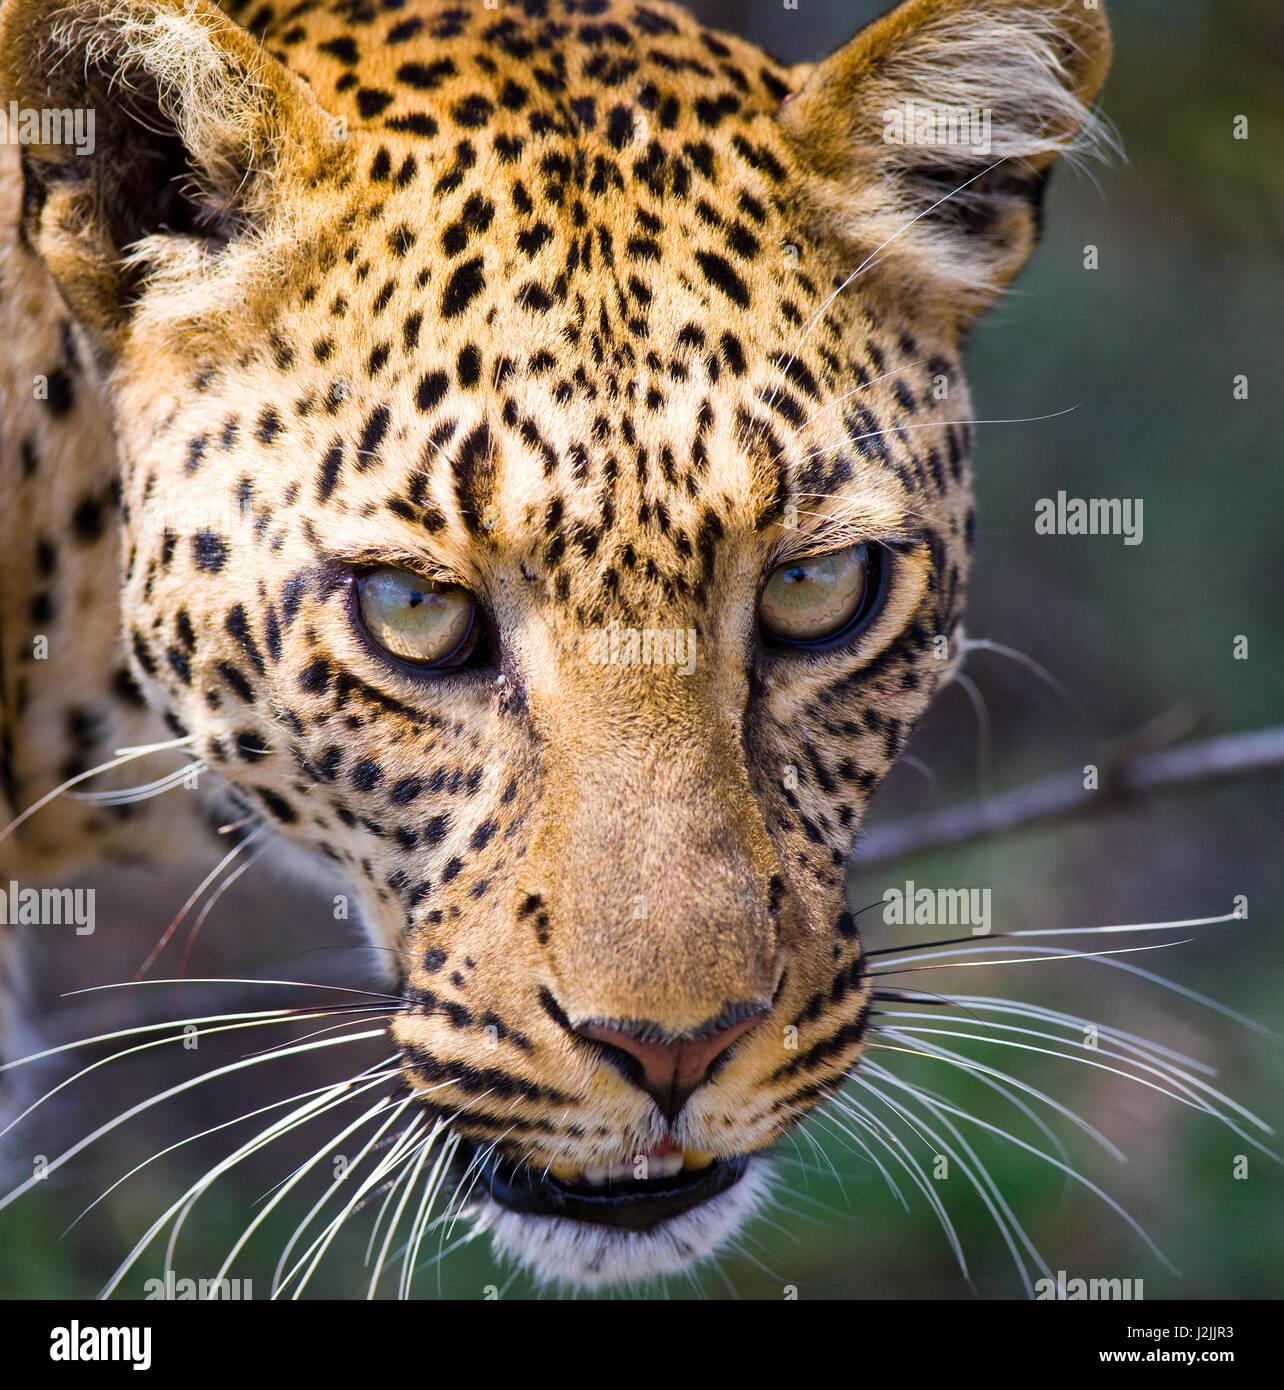 Portrait of Leopard. Close-up. National Park. Kenya. Tanzania. Maasai Mara. Serengeti. An excellent illustration. - Stock Image